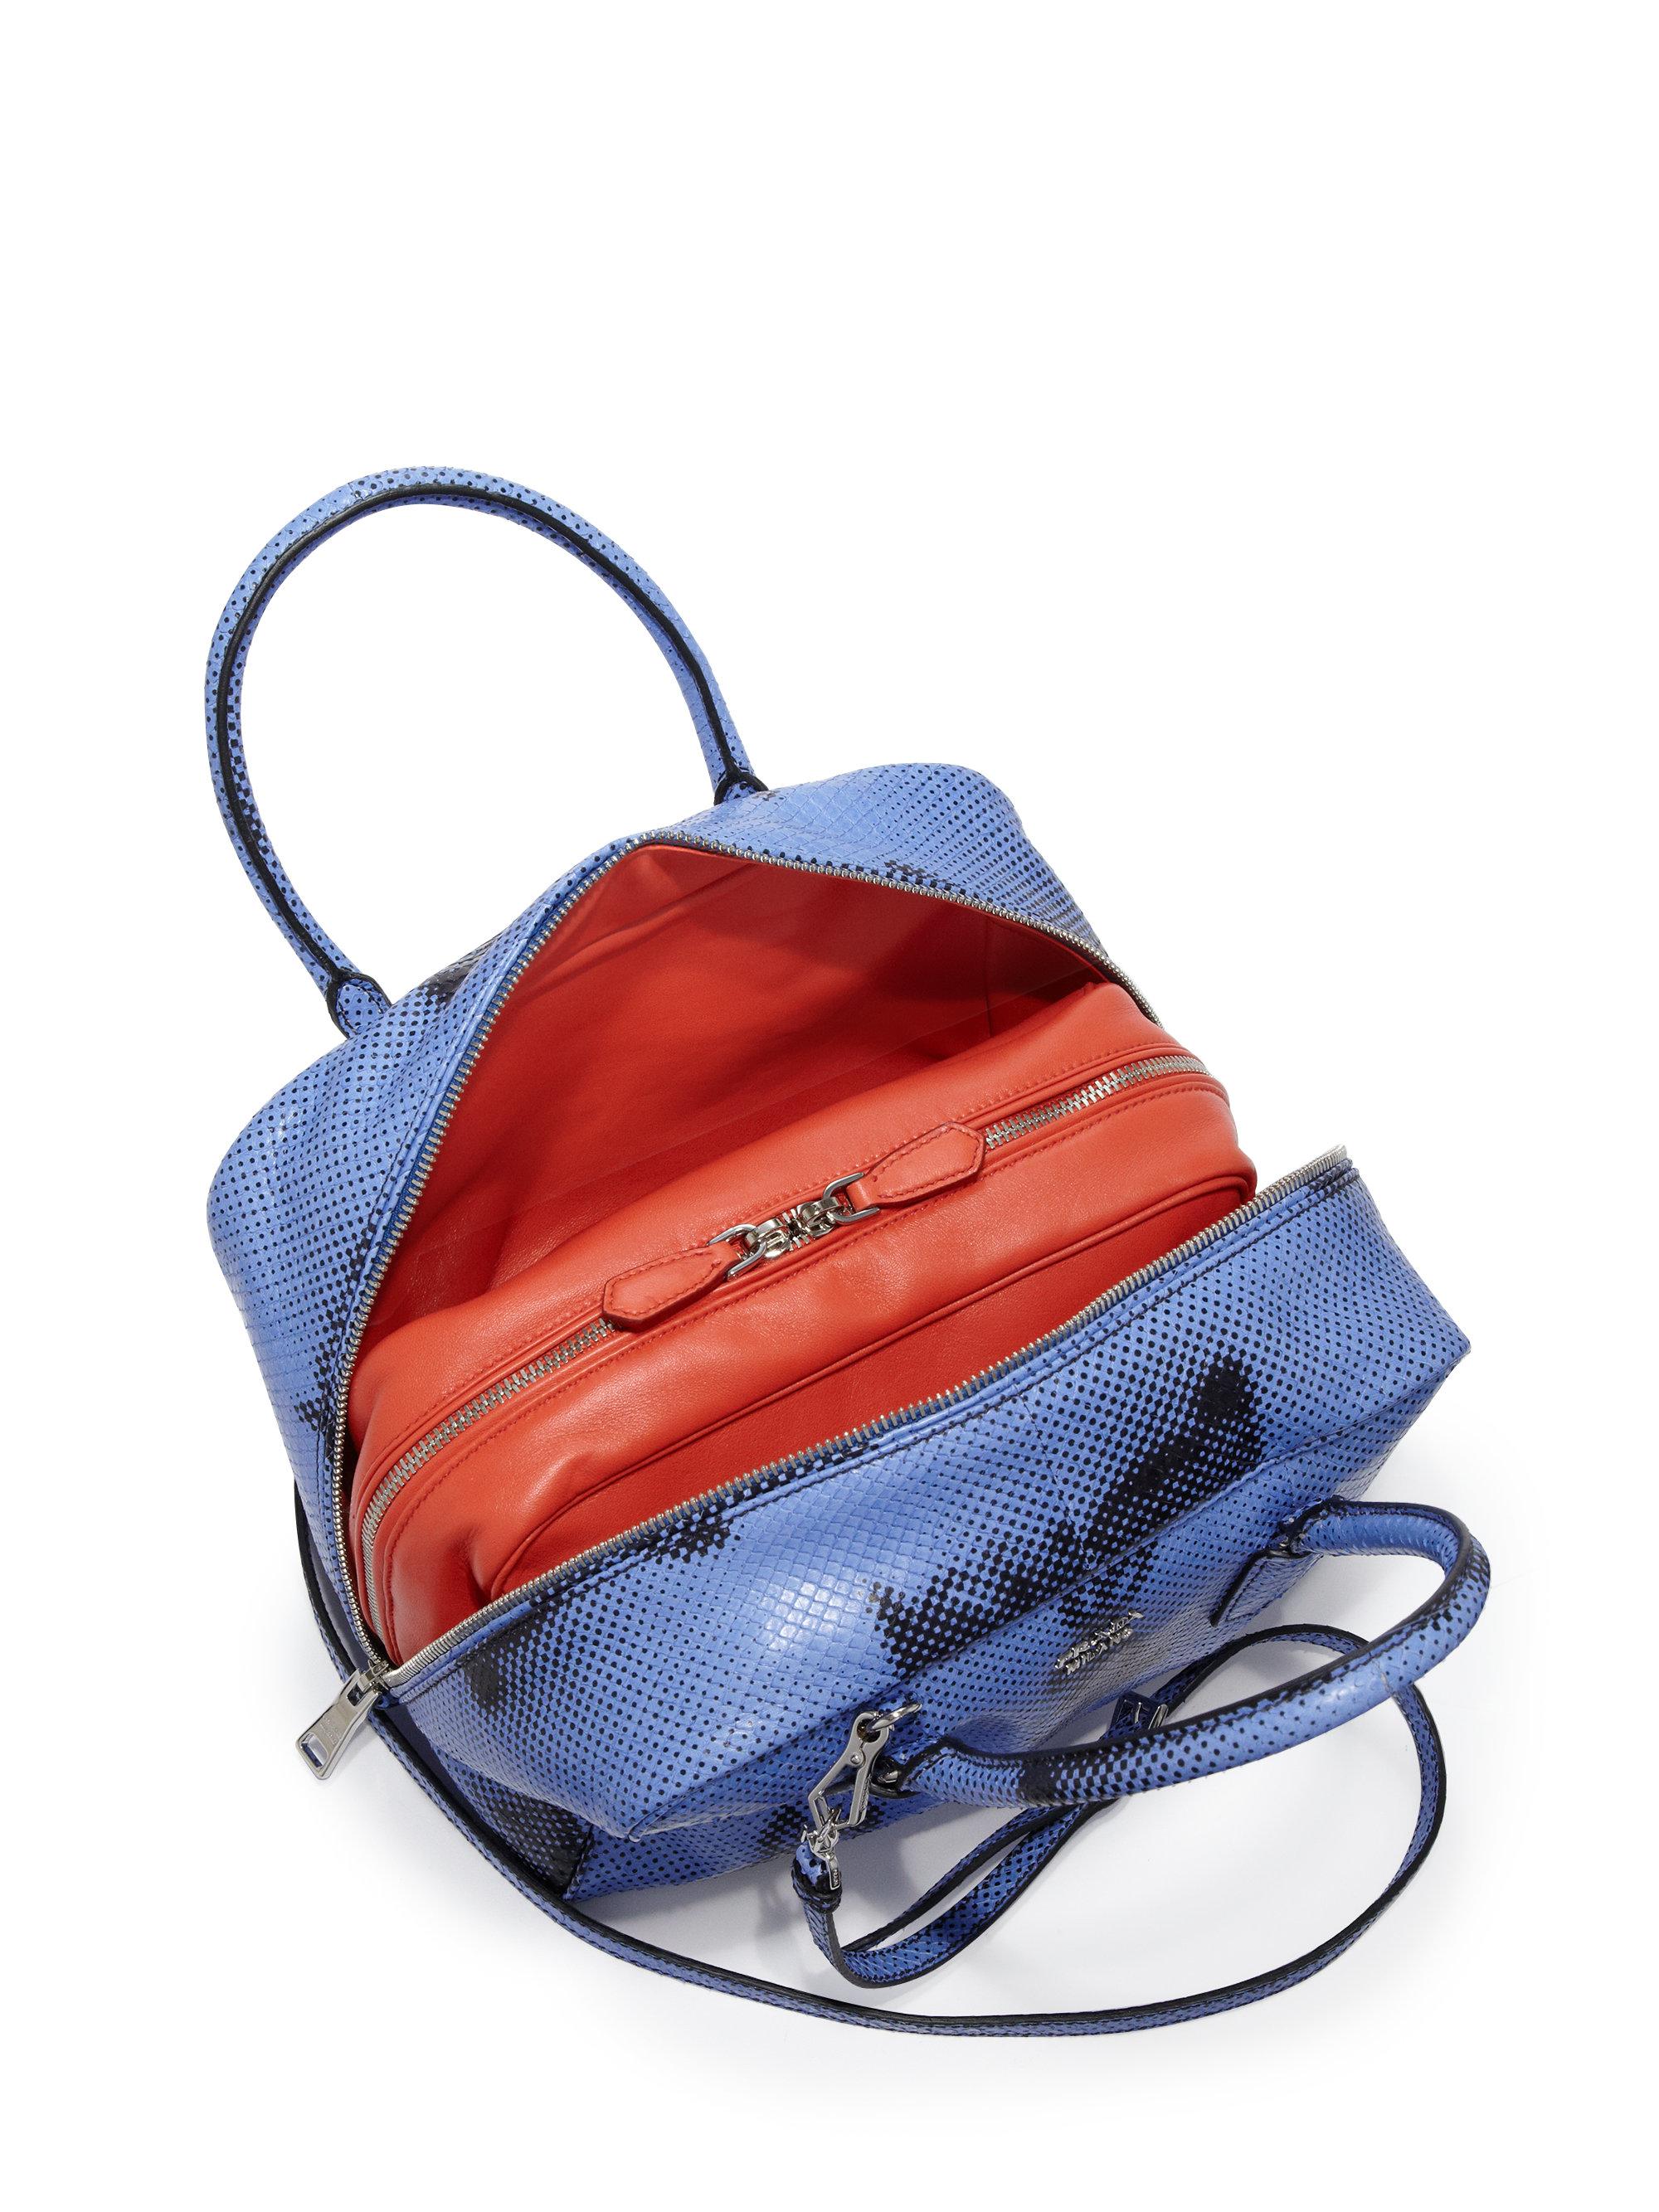 authentic prada handbags online - Prada Rabbit-print Python Inside Bag in Blue | Lyst